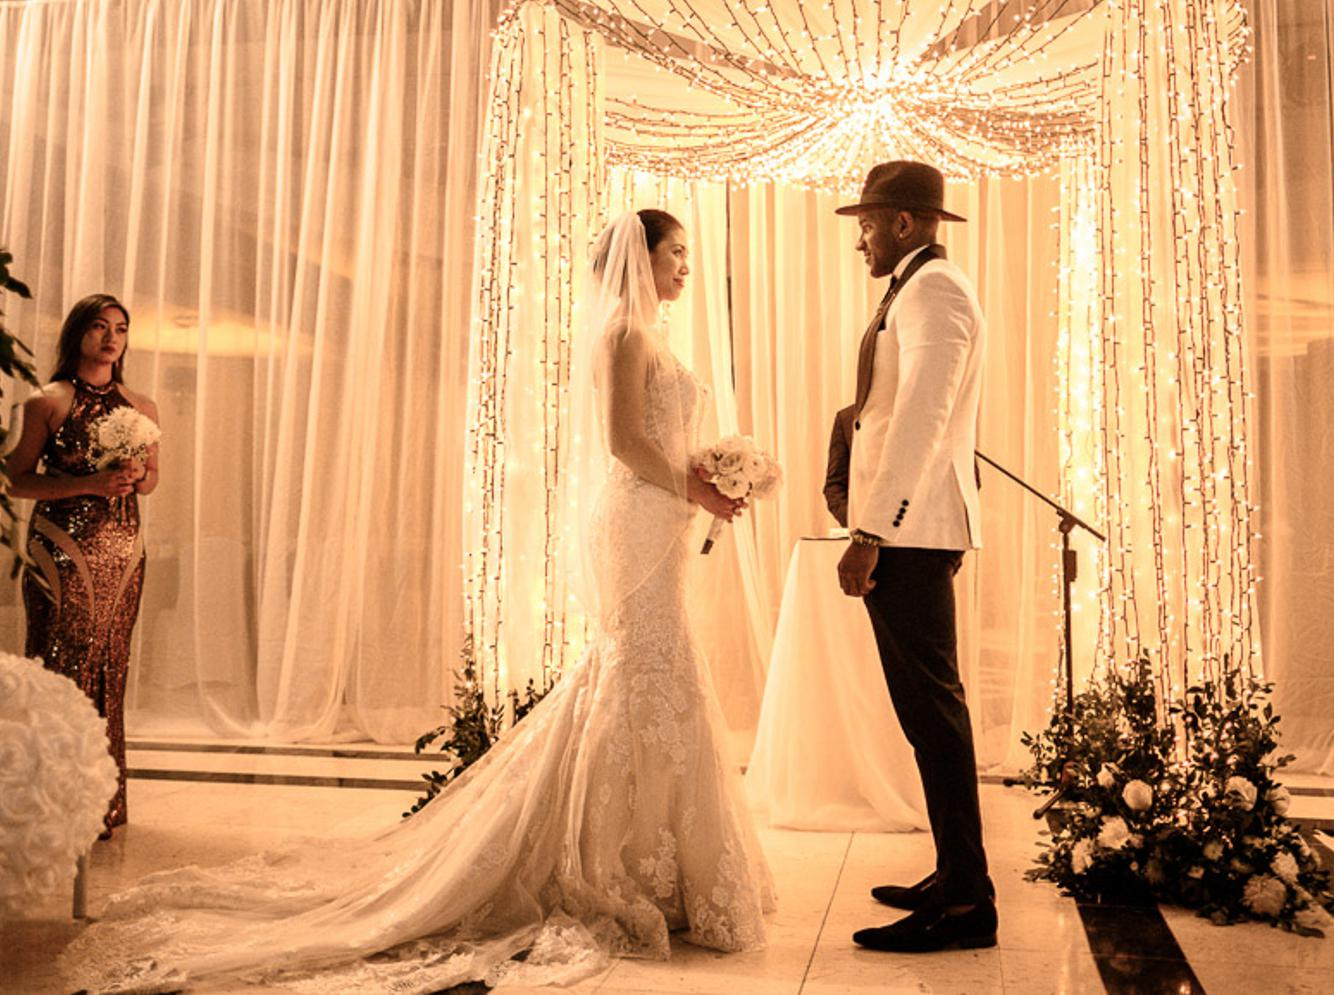 bodas-sin-clasificar-sin-tema-cuba-41331.jpg